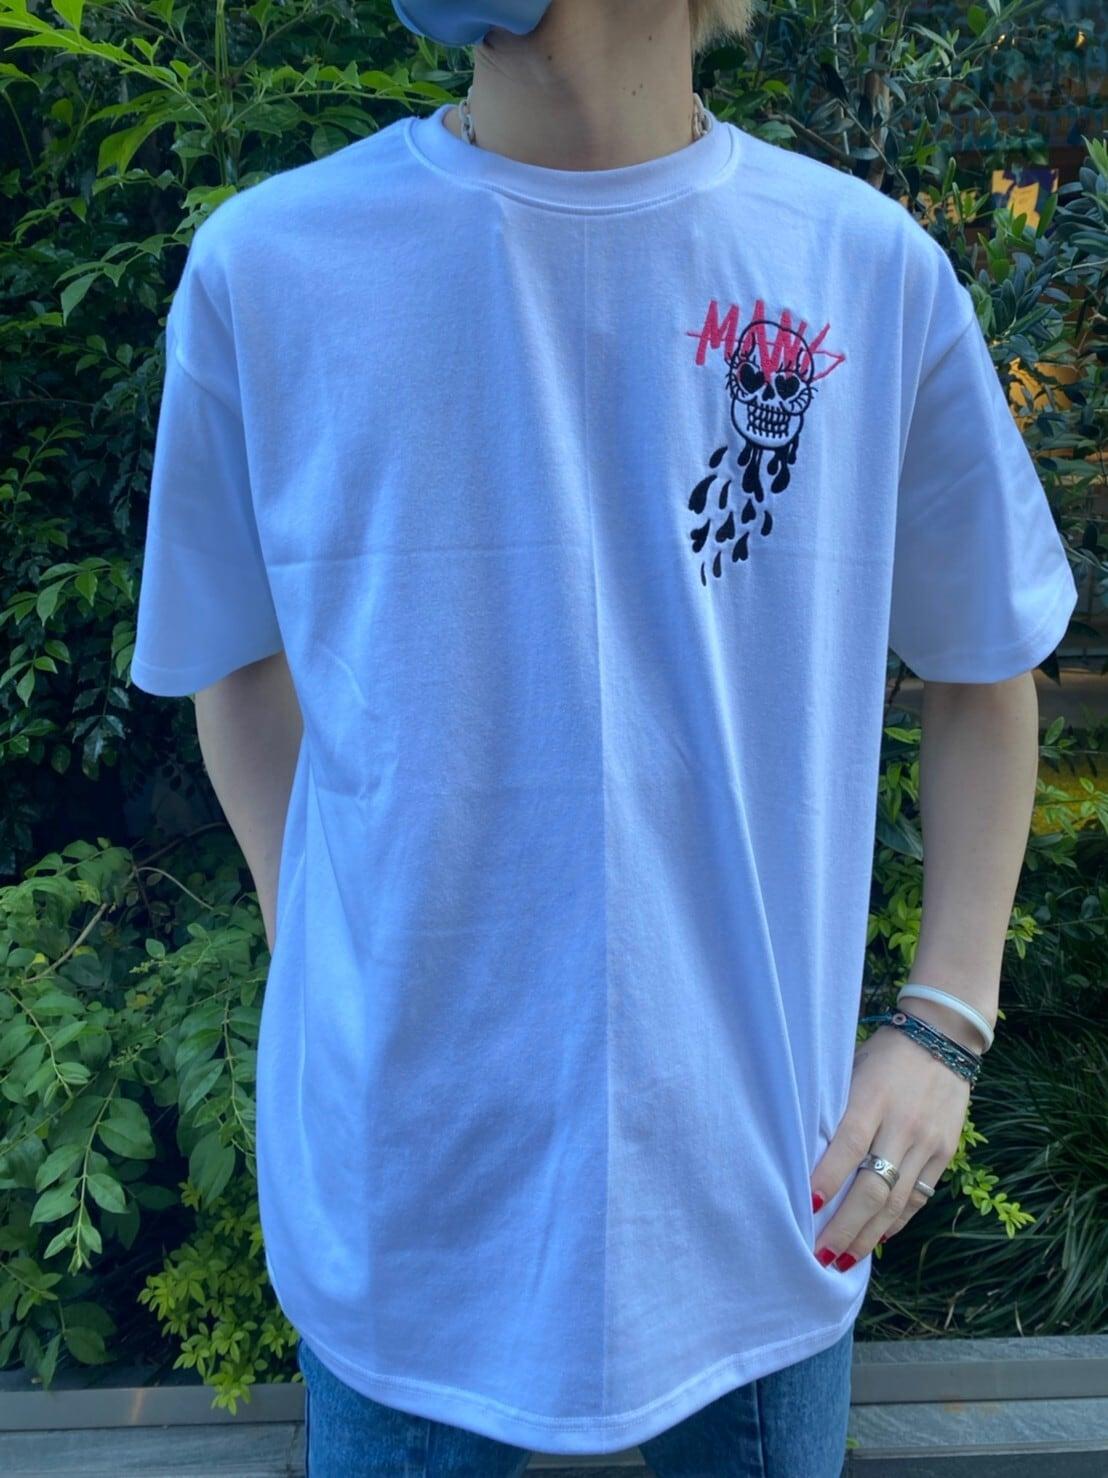 【MAN-G】スカル刺繍Tシャツ